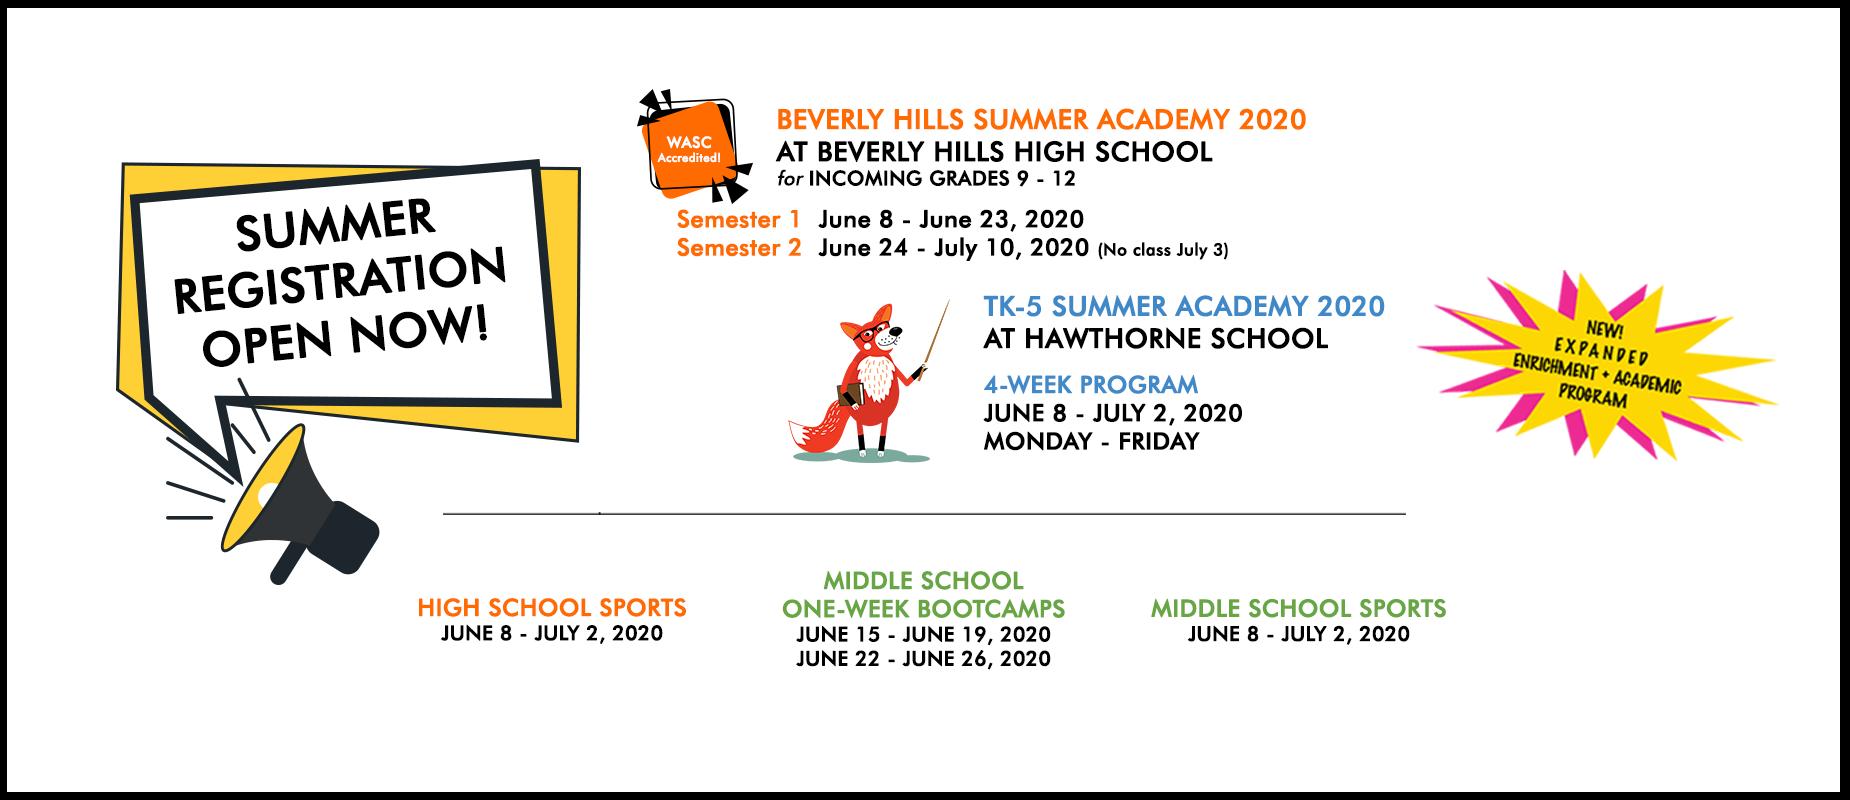 summer registration now open visit summer academy tab to register